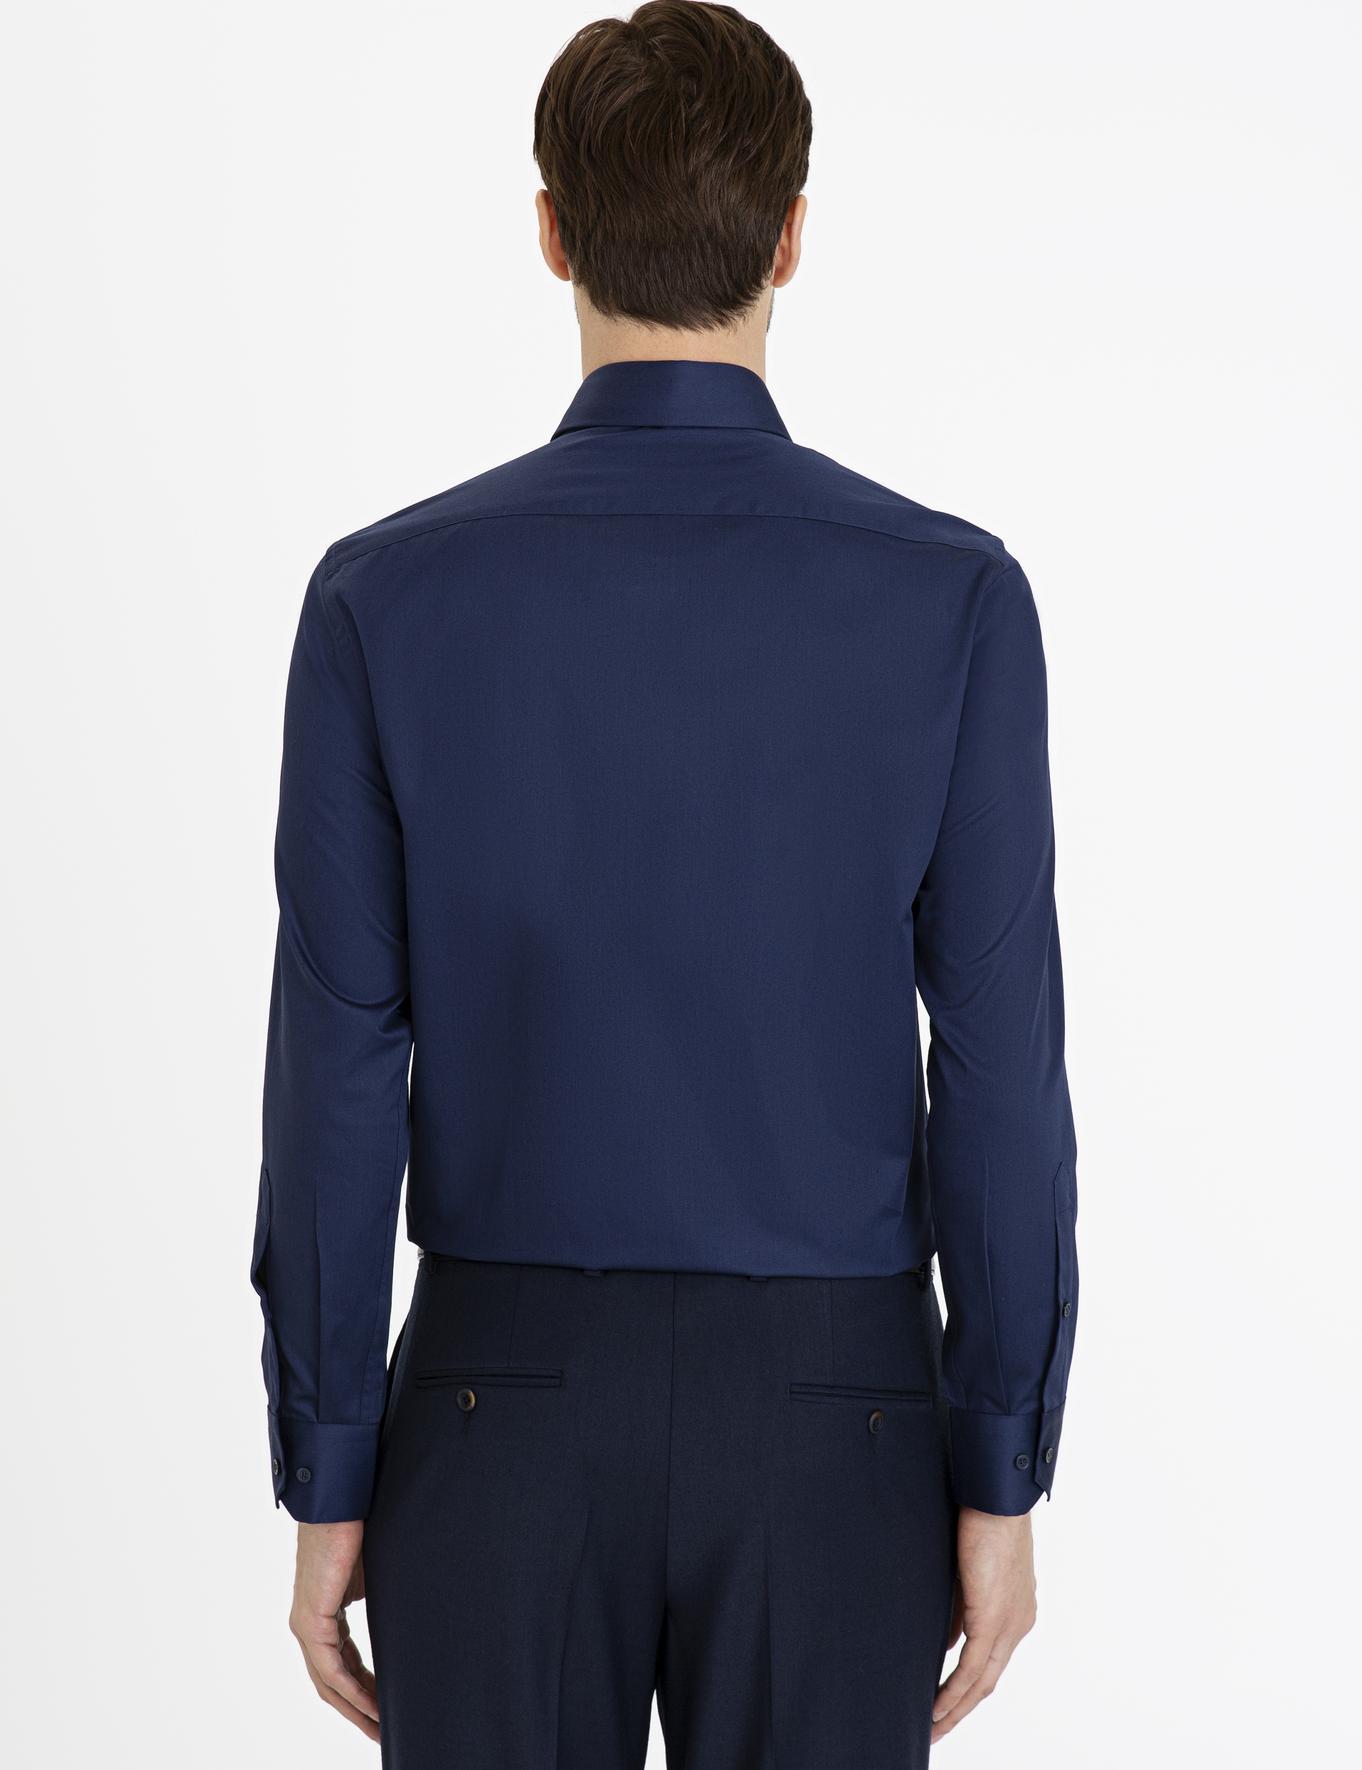 Lacivert Slim Fit Basic Gömlek - 50229004058